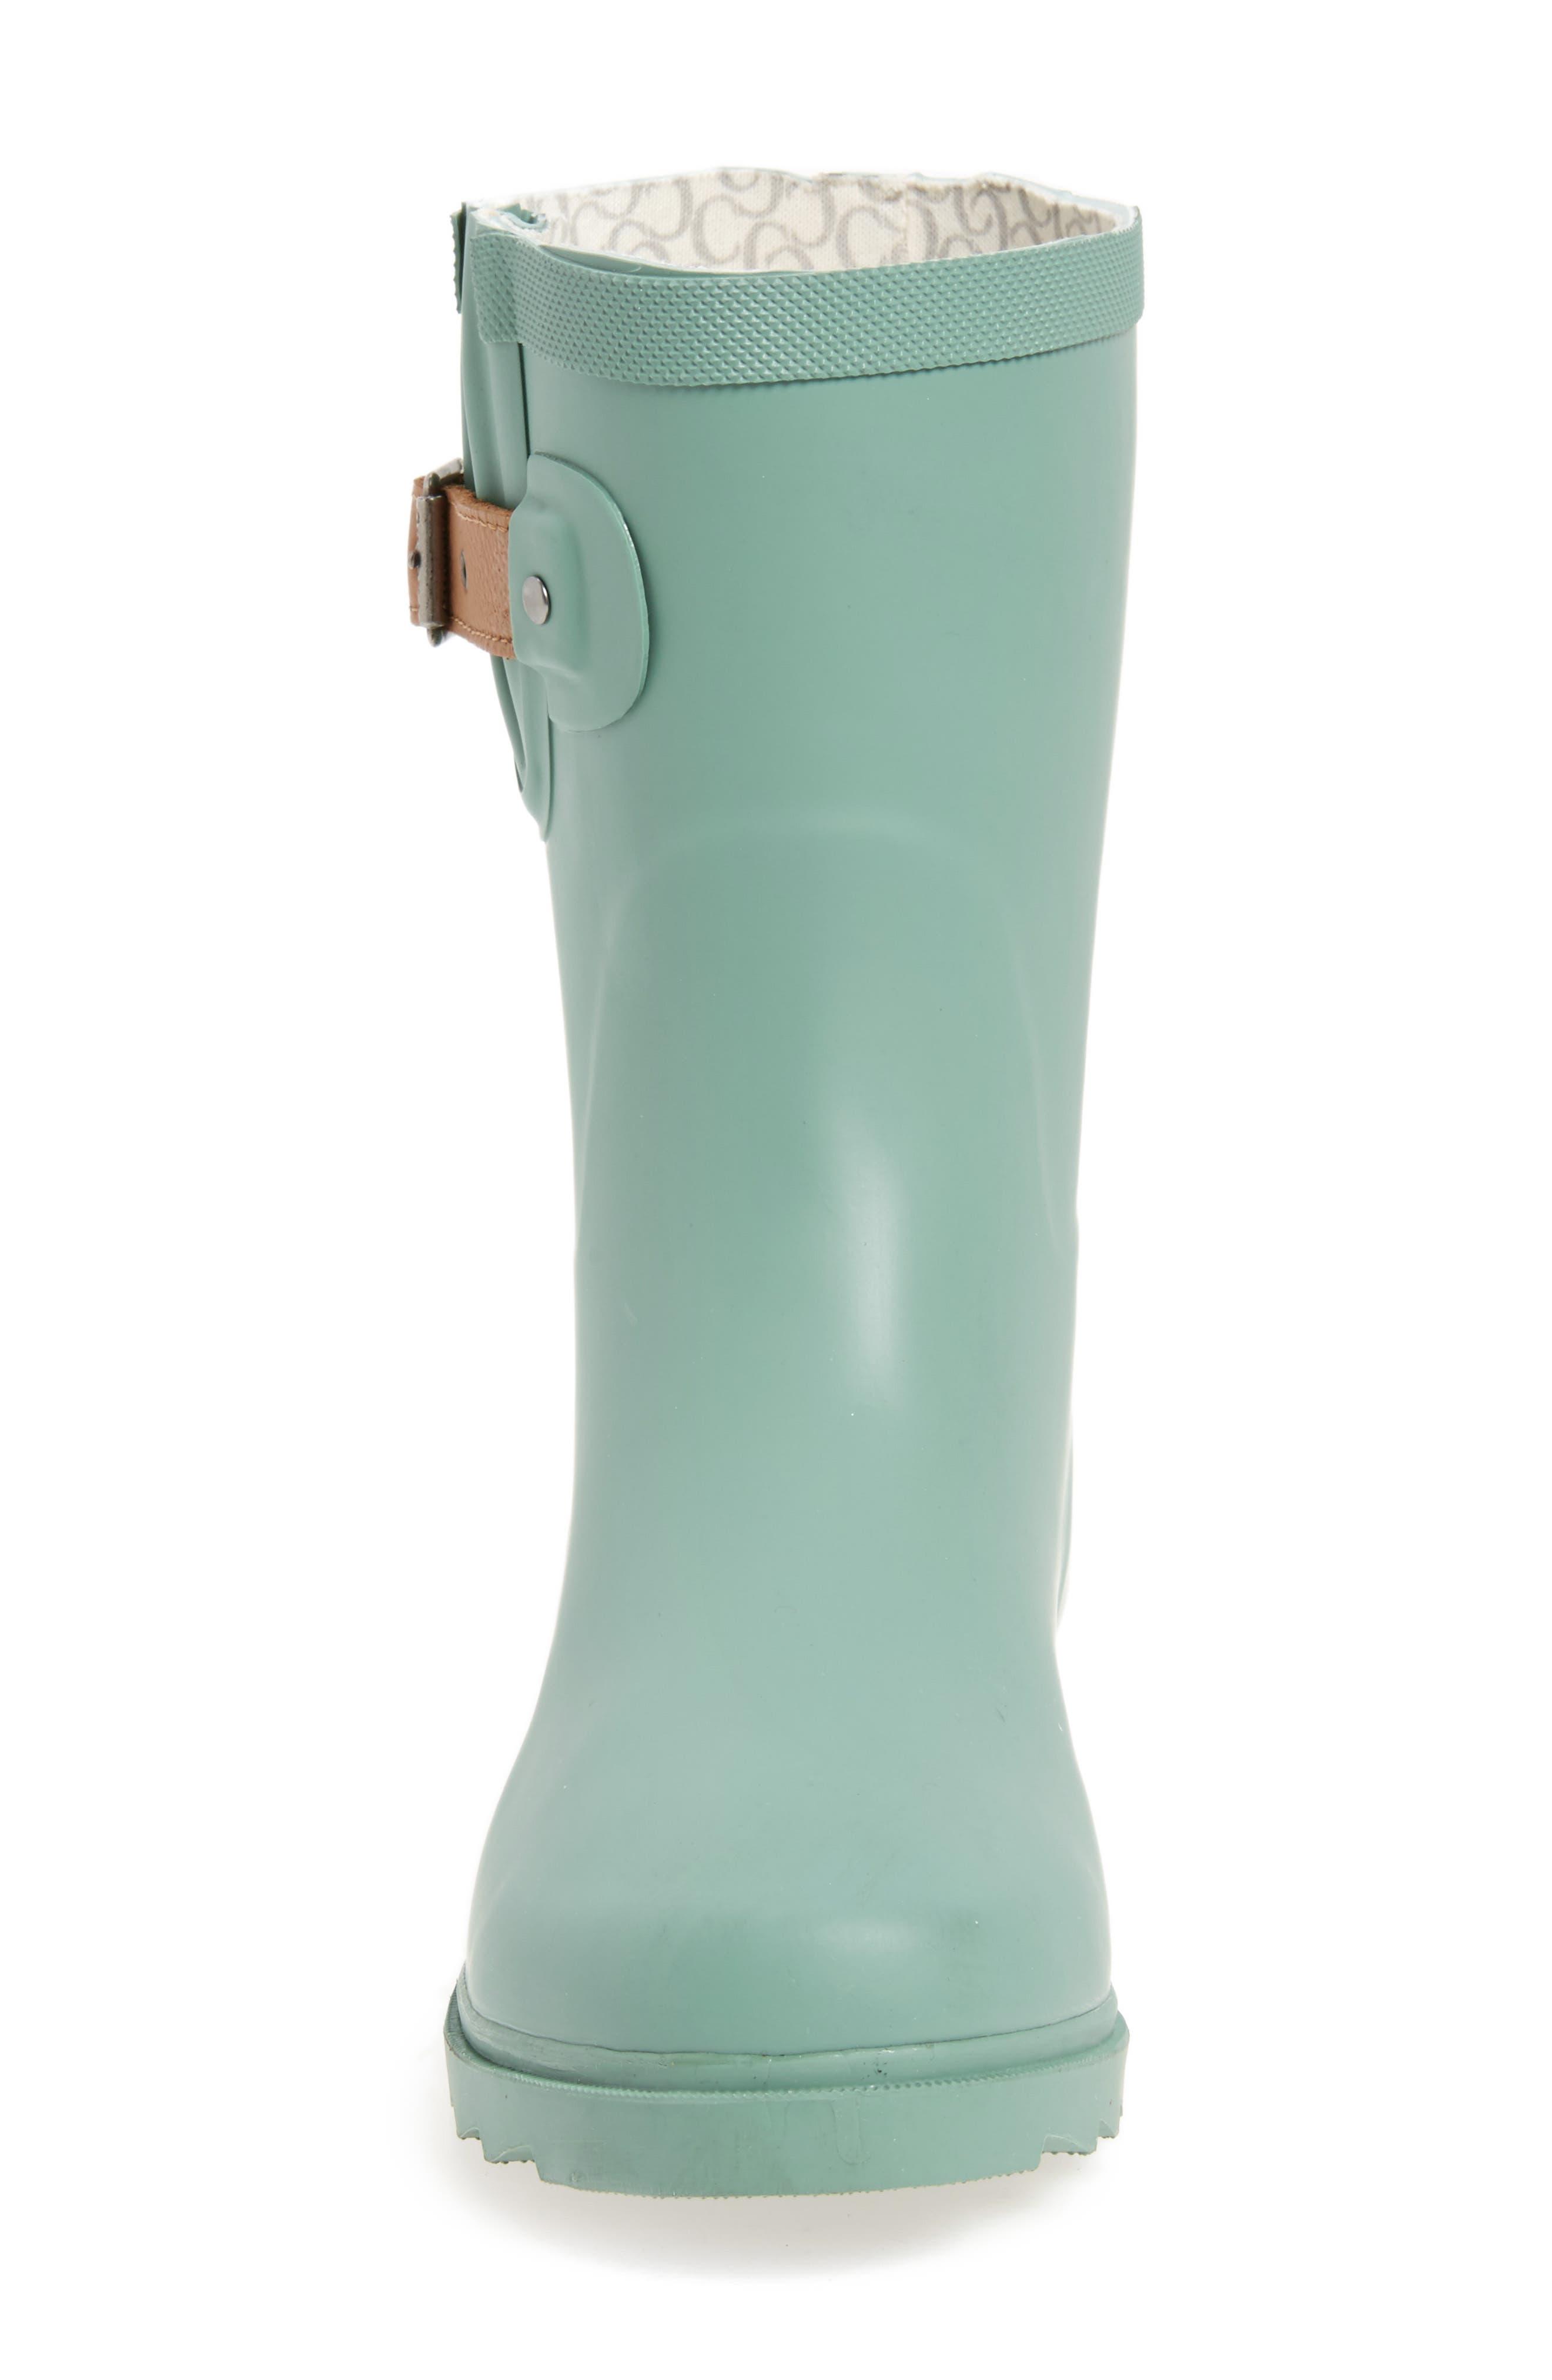 Alternate Image 3  - Chooka 'Top Solid Mid Height' Rain Boot (Women)